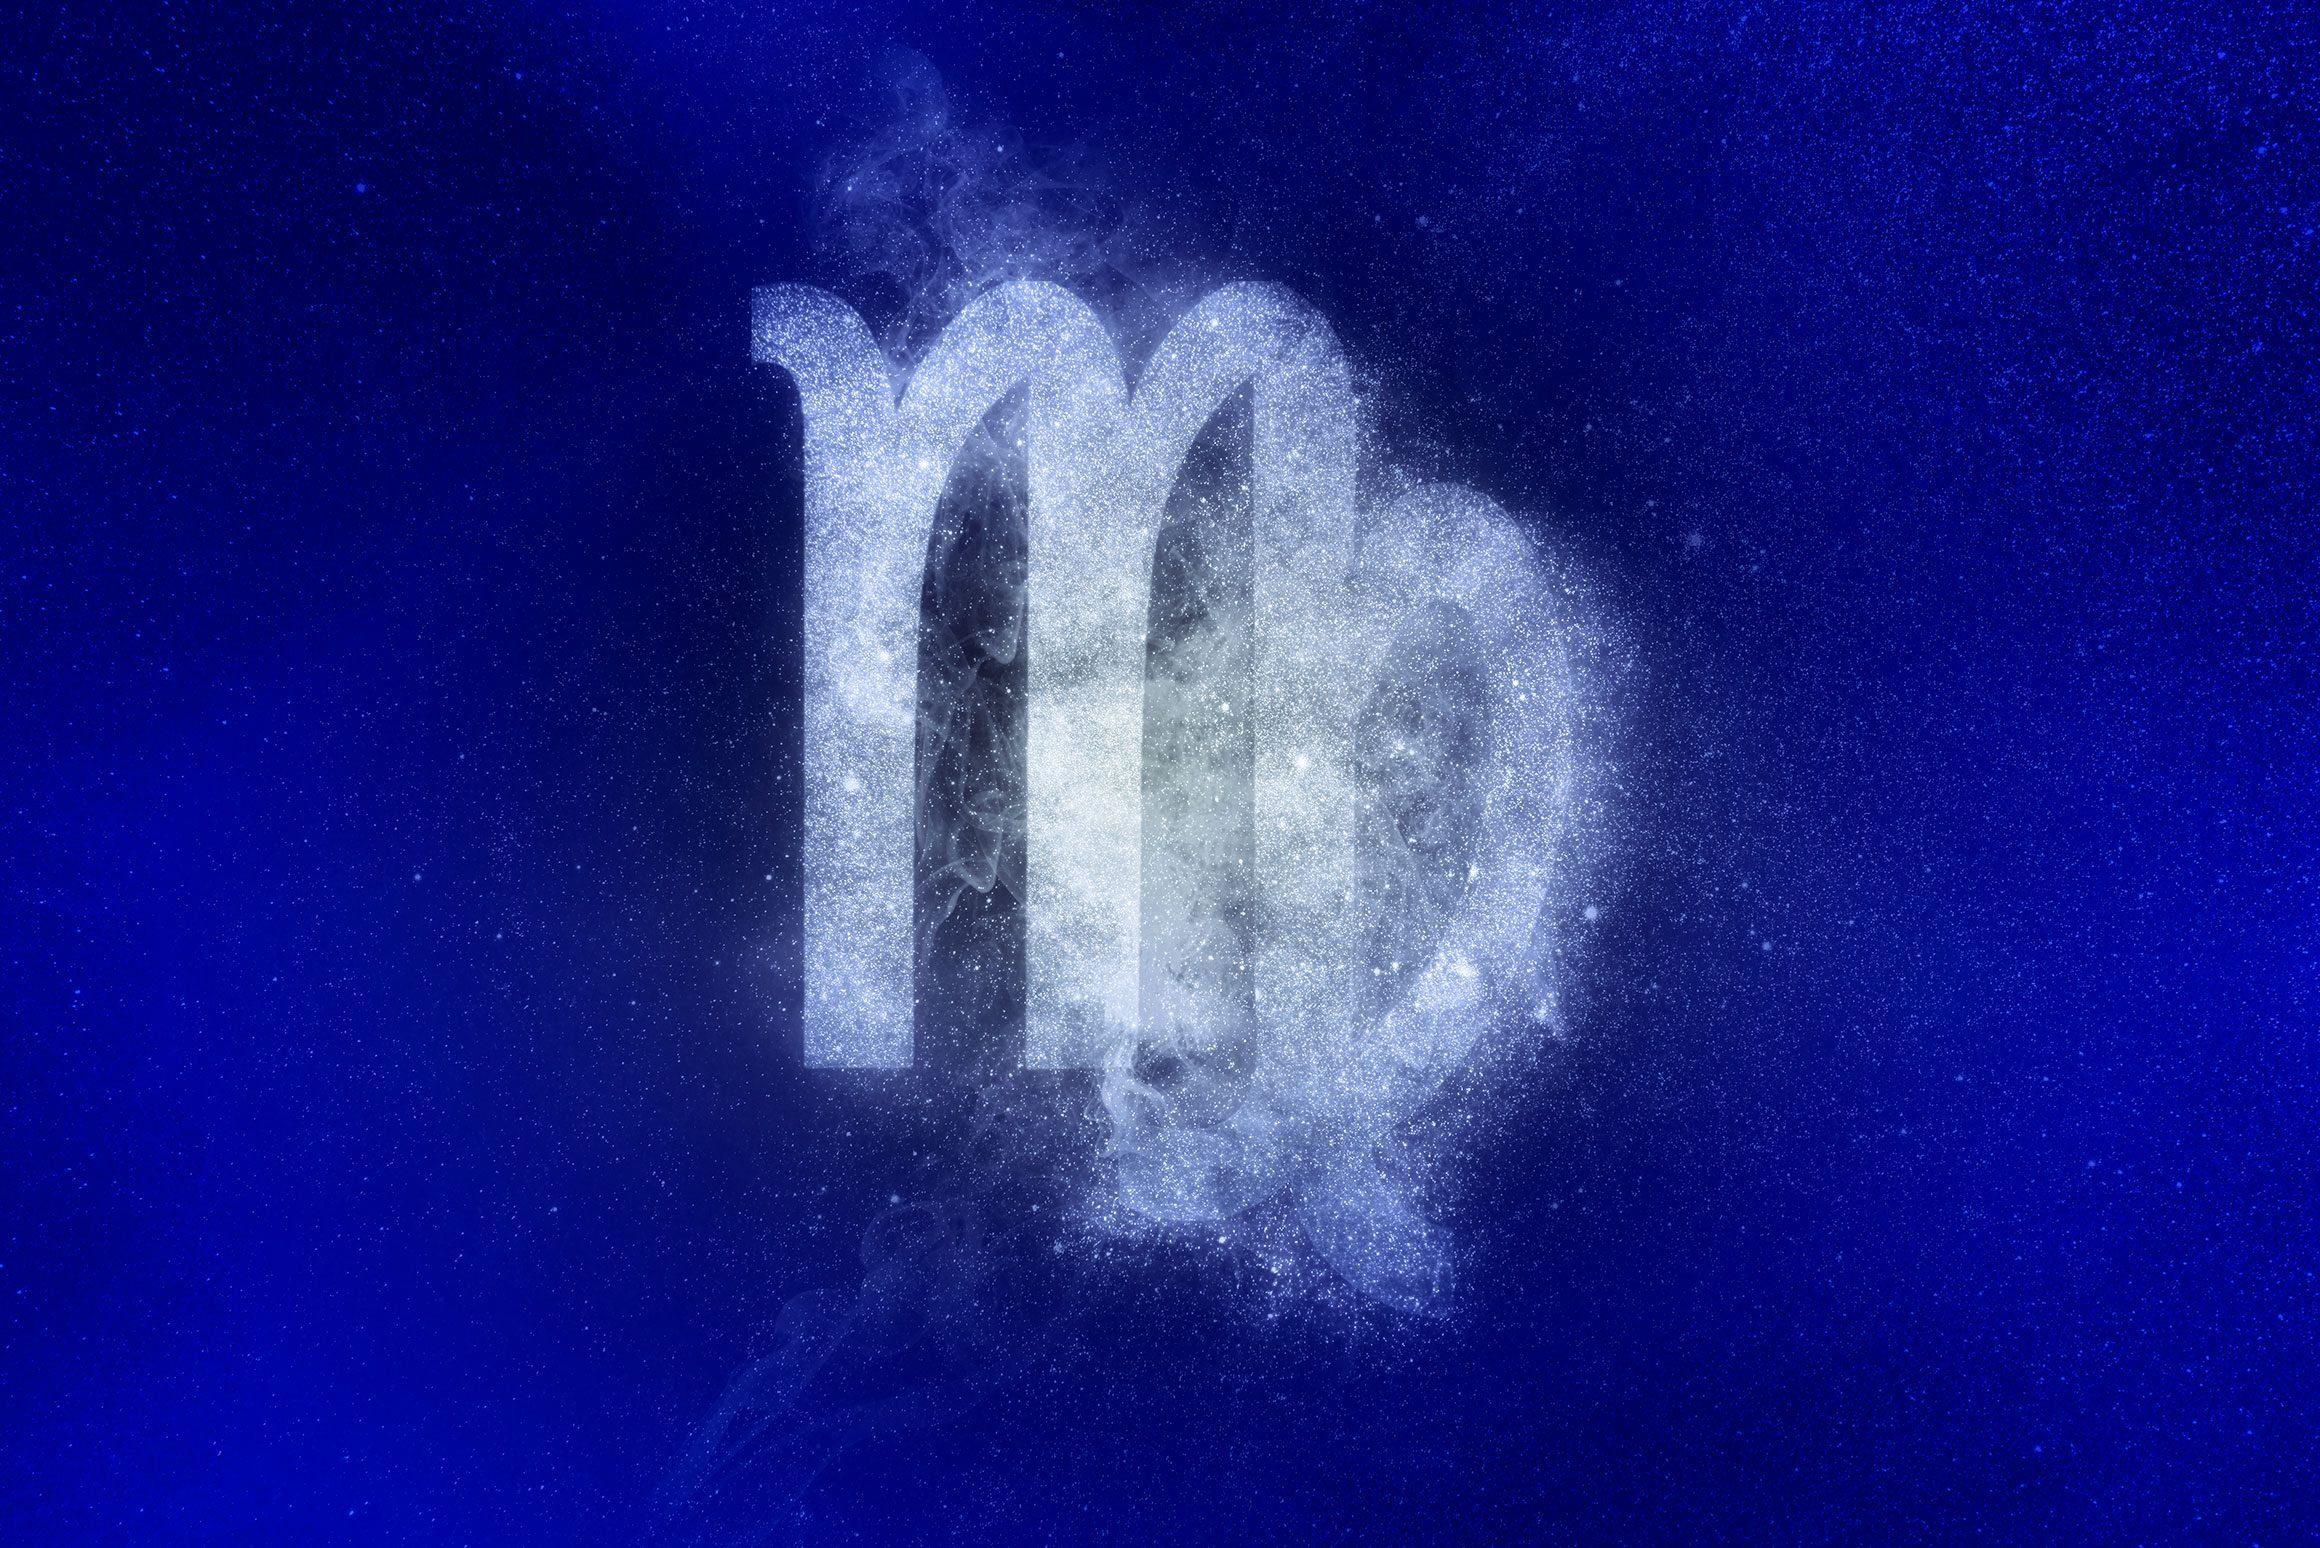 virgo zodiac symbol in winter colors